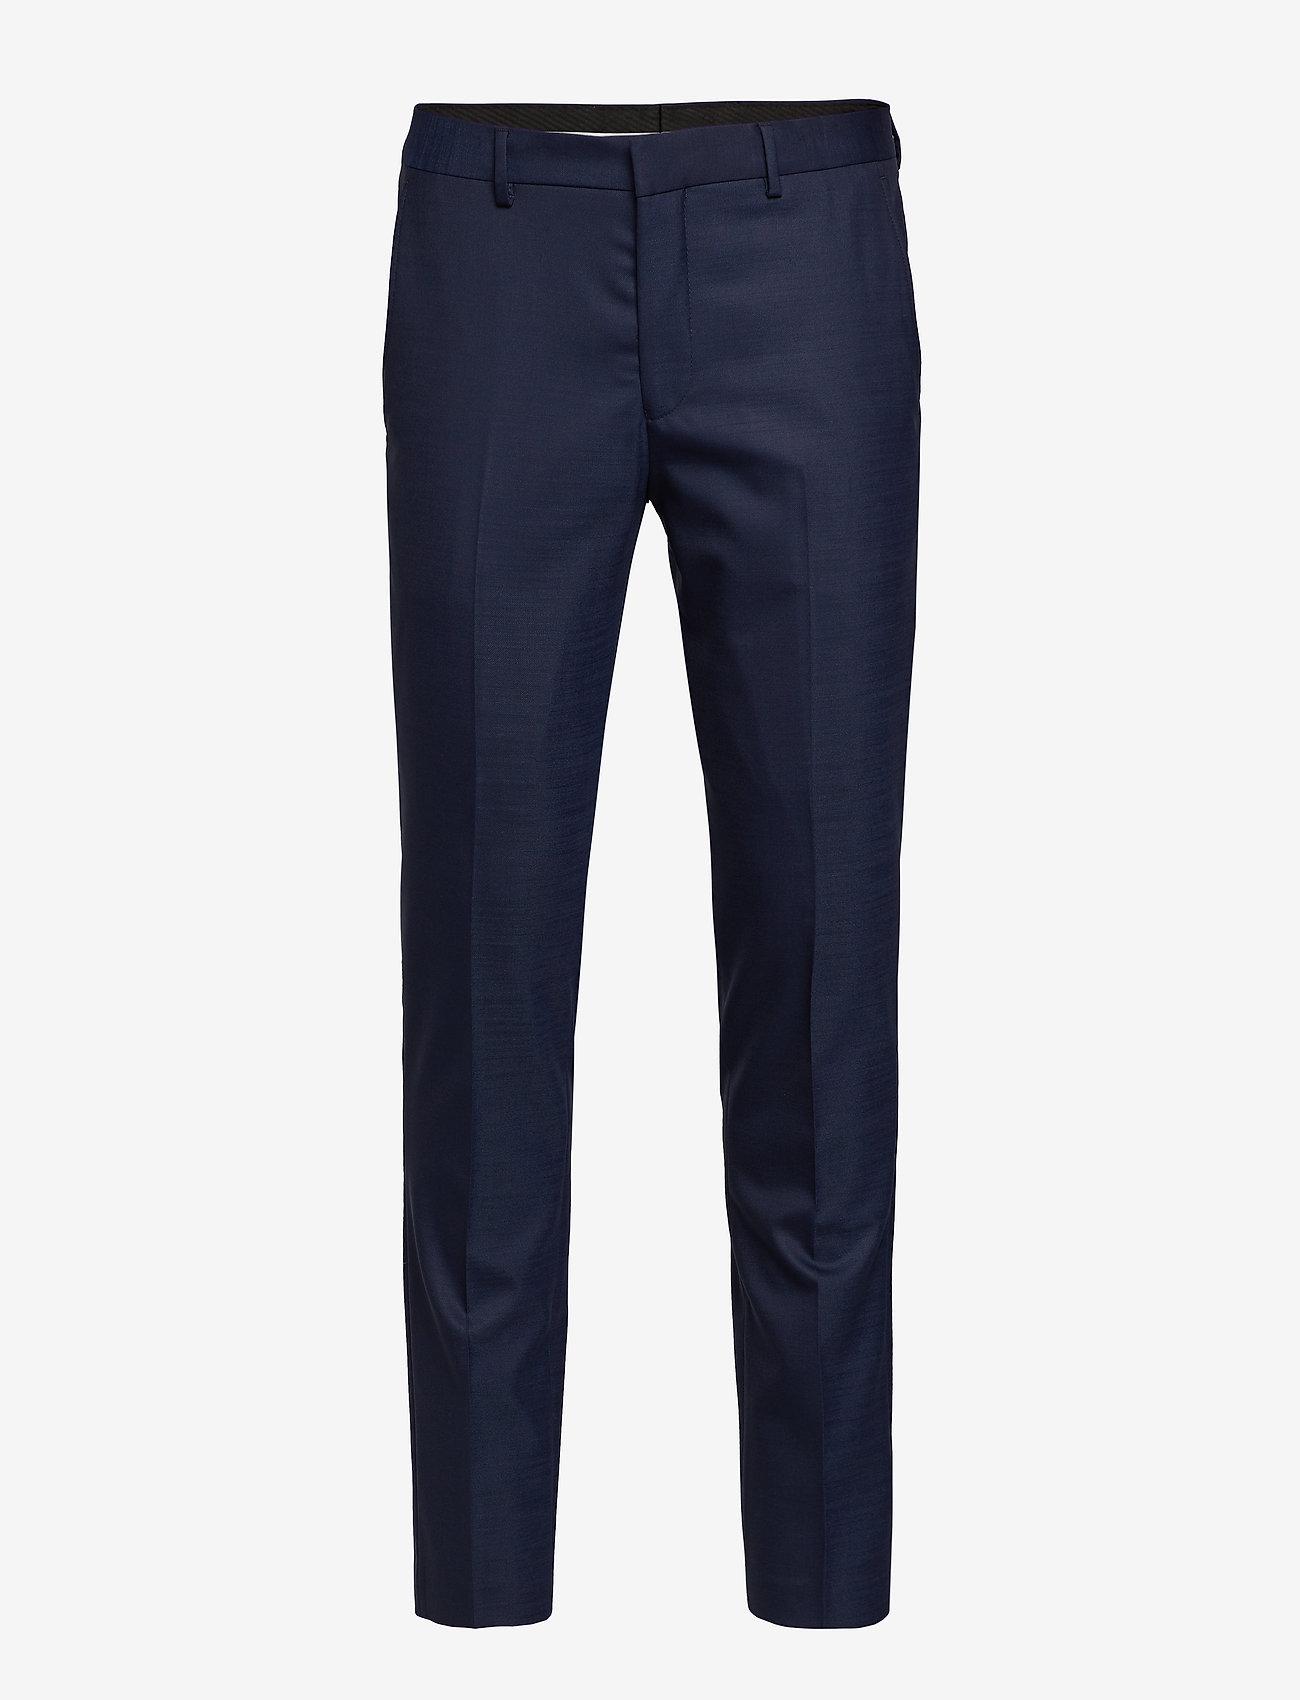 Selected Homme - SLHSLIM-MYLOSTATE FLEX DK BL TRS B NOOS - suitbukser - dark blue - 0